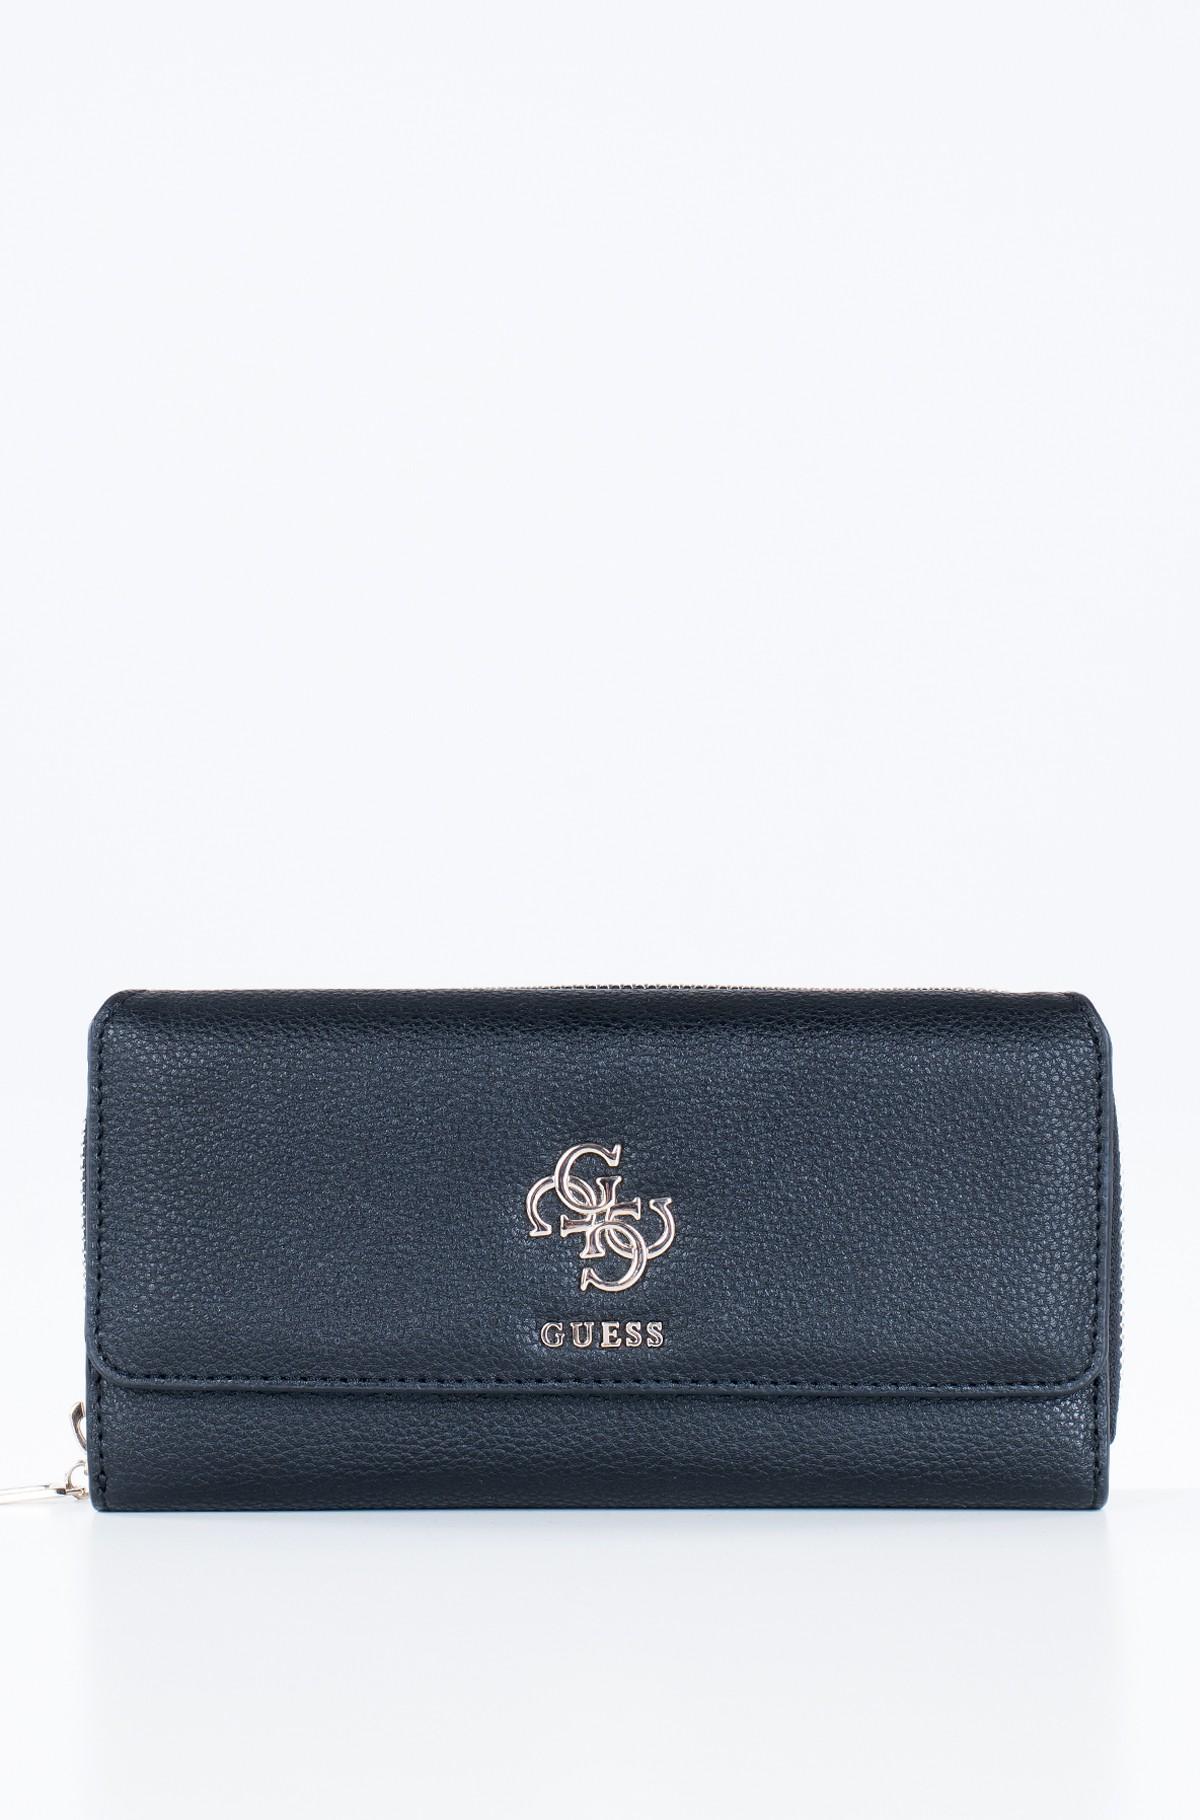 Wallet SWVG68 53620-full-1